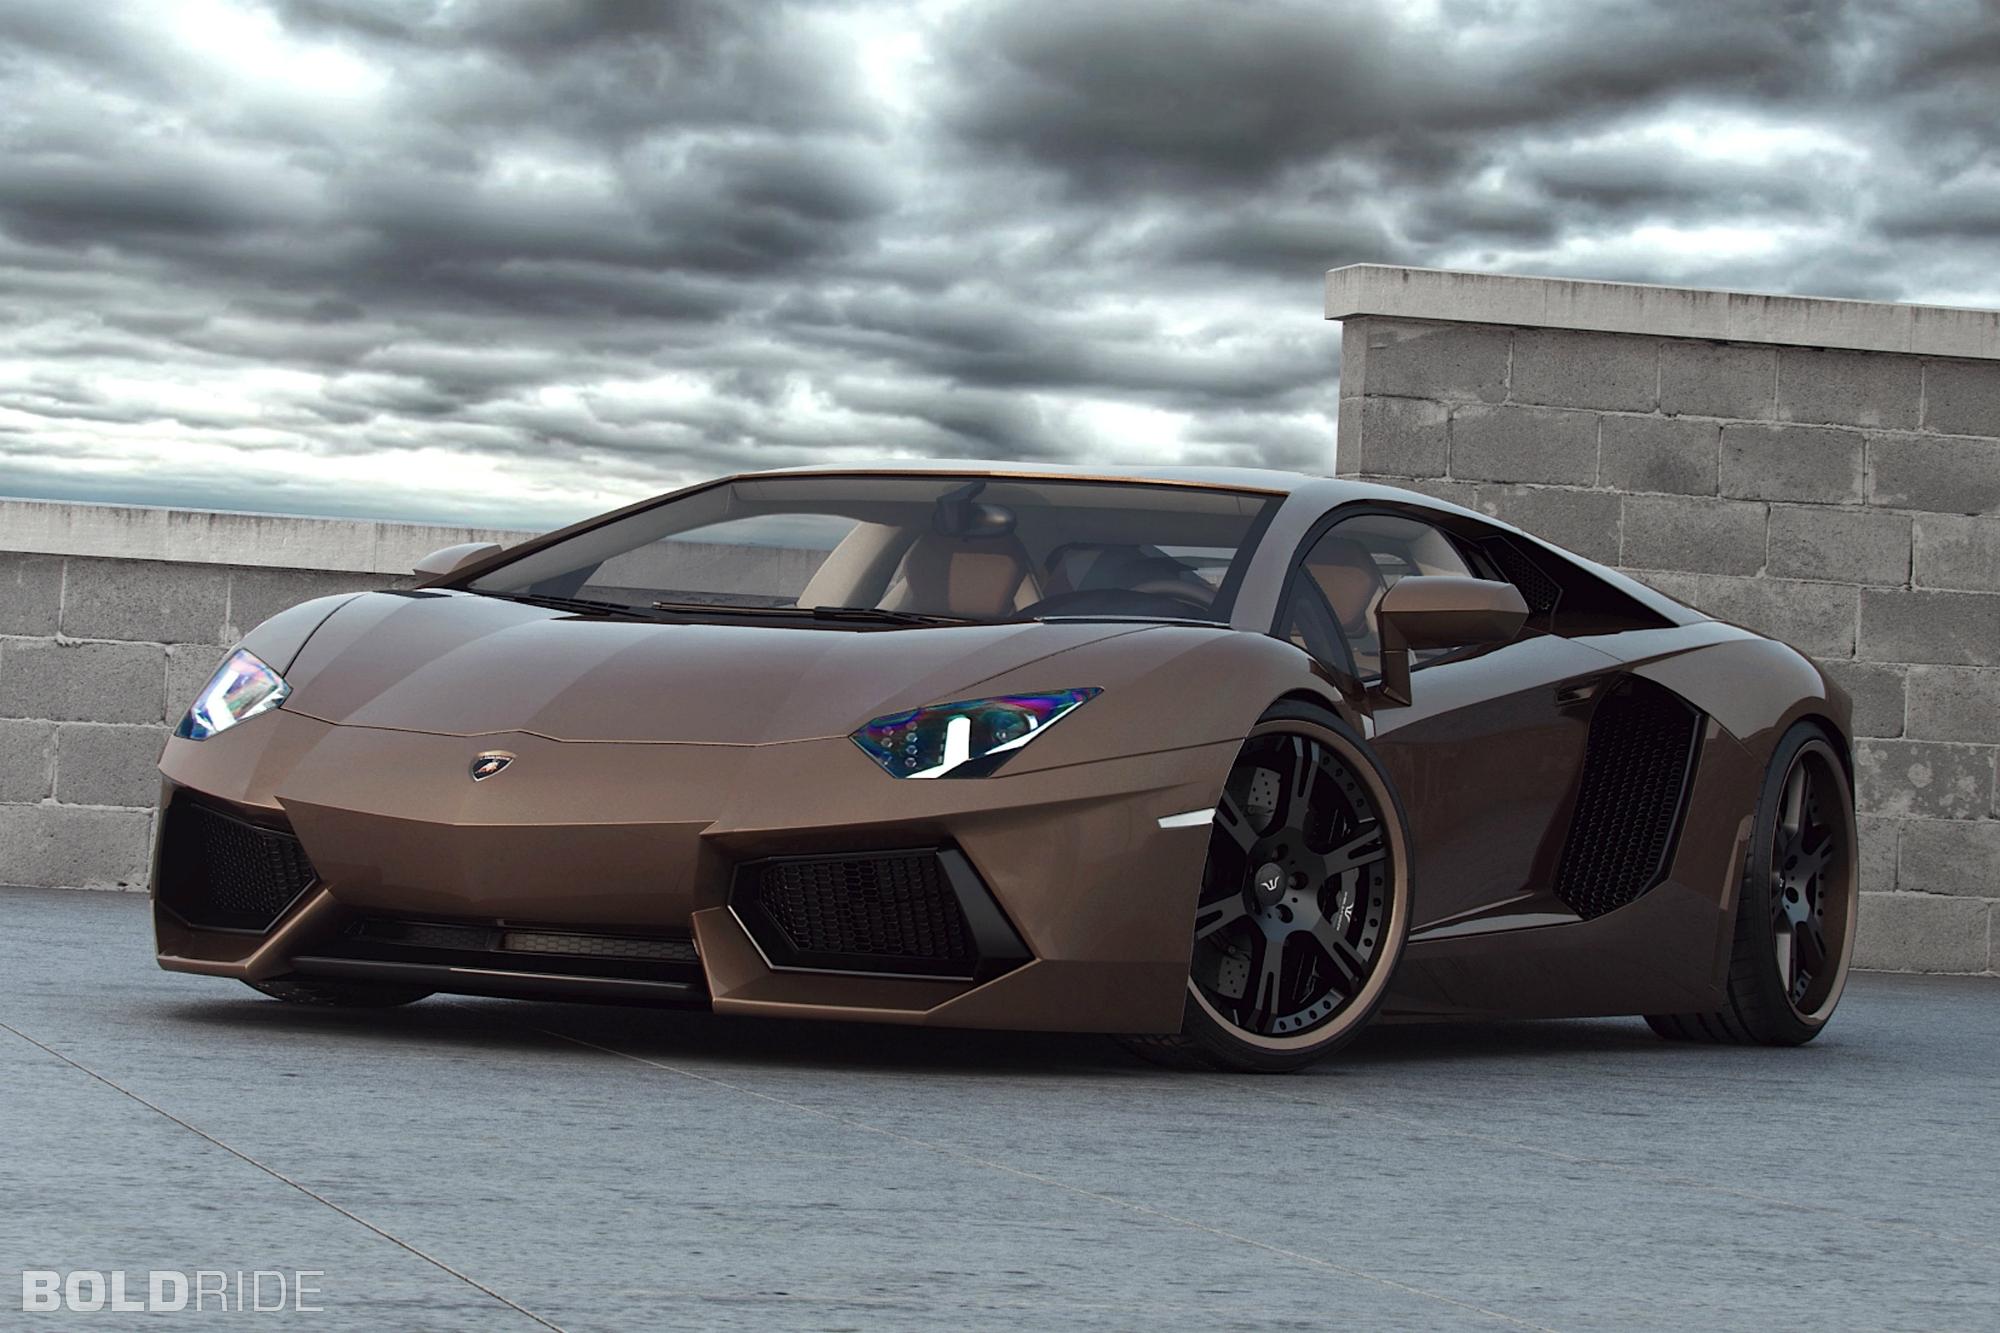 2012 Wheelsandmore Lamborghini Aventador LP700-4 1600 x 1200